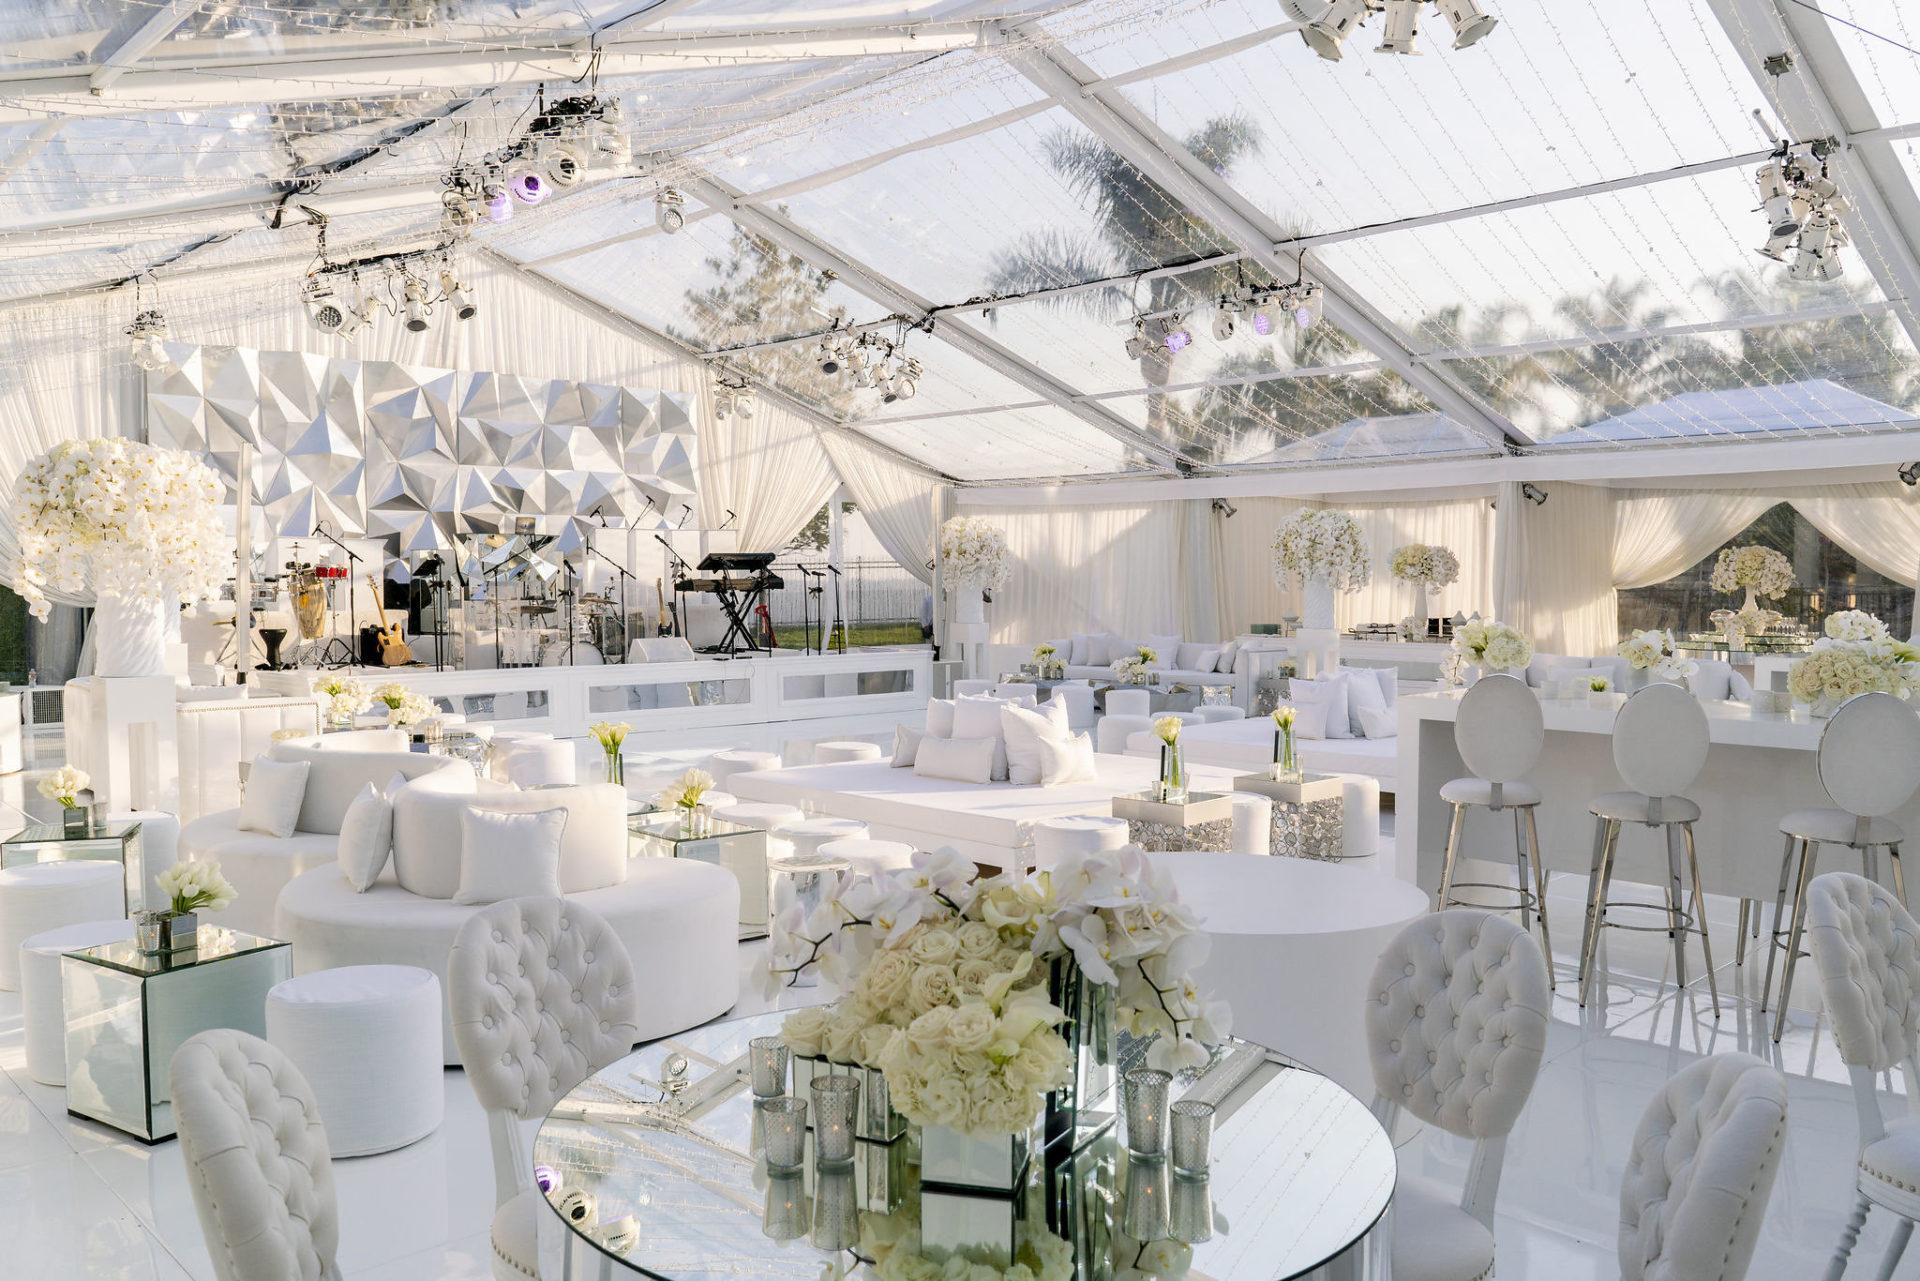 sacks Productions, Los Angeles Wedding Planners, Luxury Destination Wedding Planners Los Angeles - John & Joseph Photography - Wedding Hub - 04